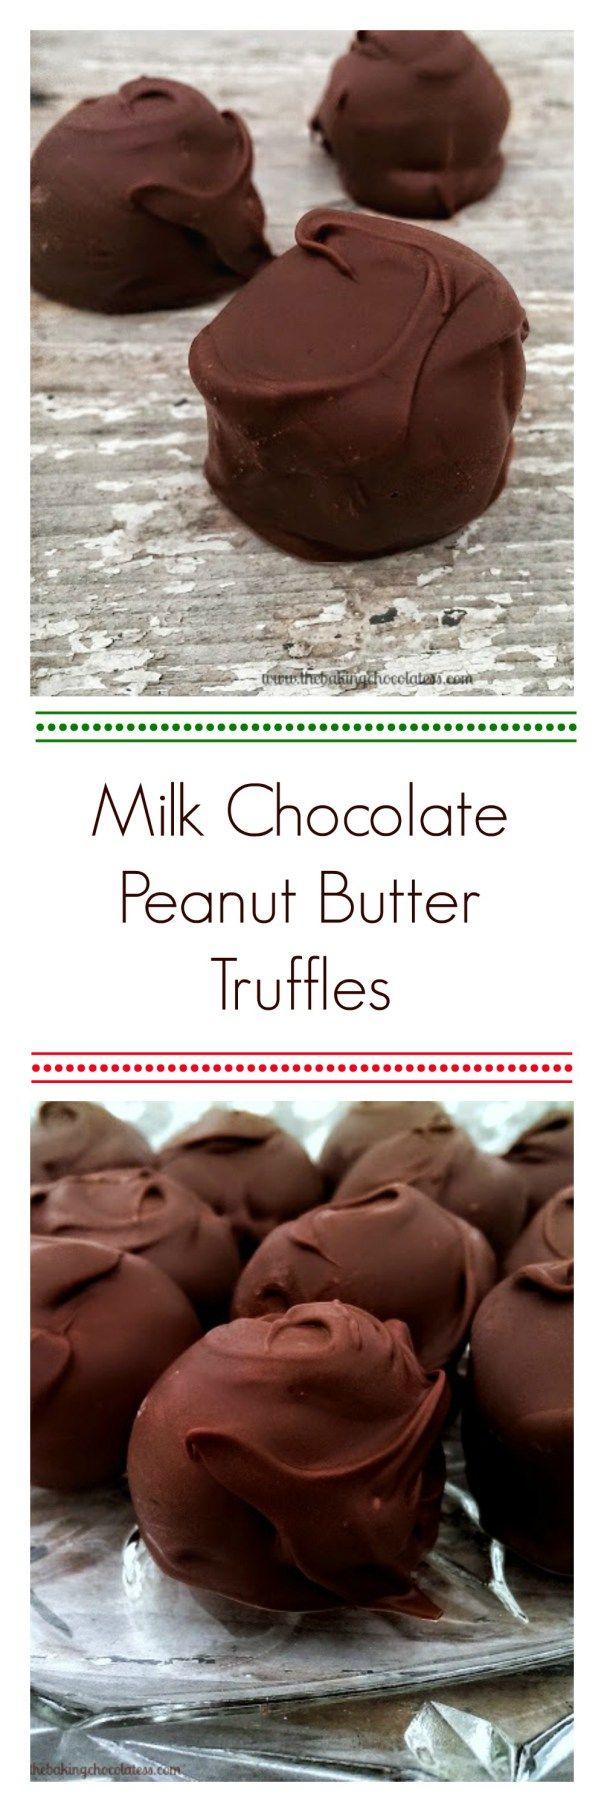 Milk Chocolate Peanut Butter Truffles – The Baking ChocolaTess